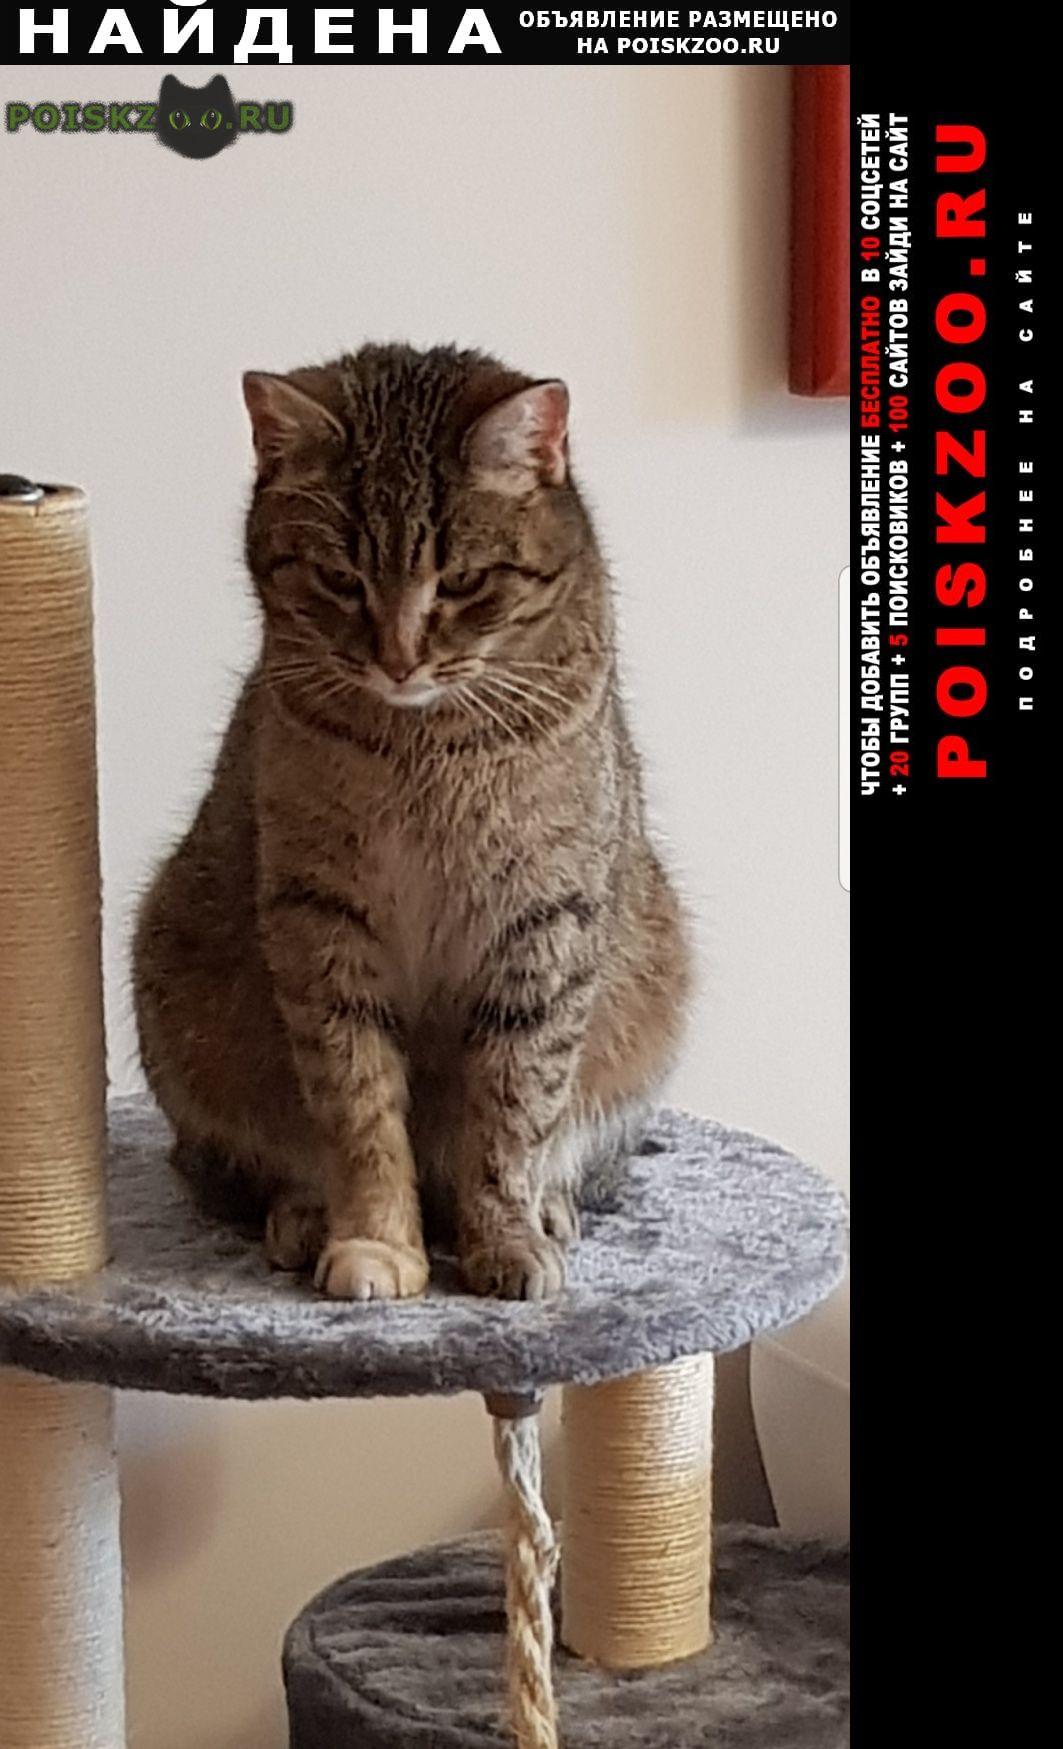 Найдена кошка тоскует по хозяину Светлогорск